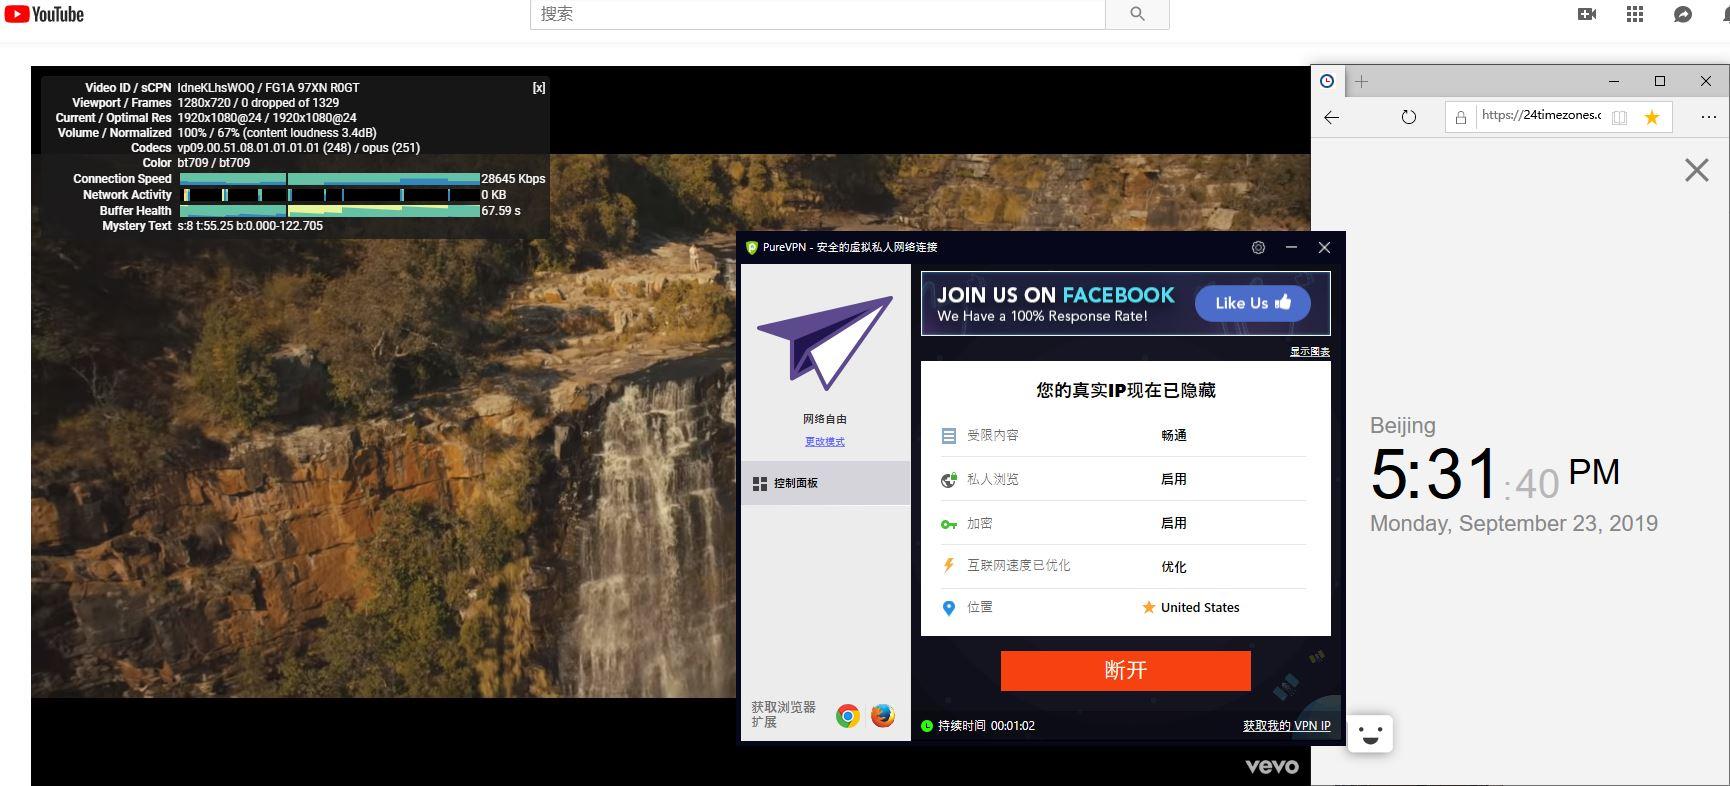 windows purevpn United States 服务器 中国VPN翻墙 科学上网 YouTube测速-20190923